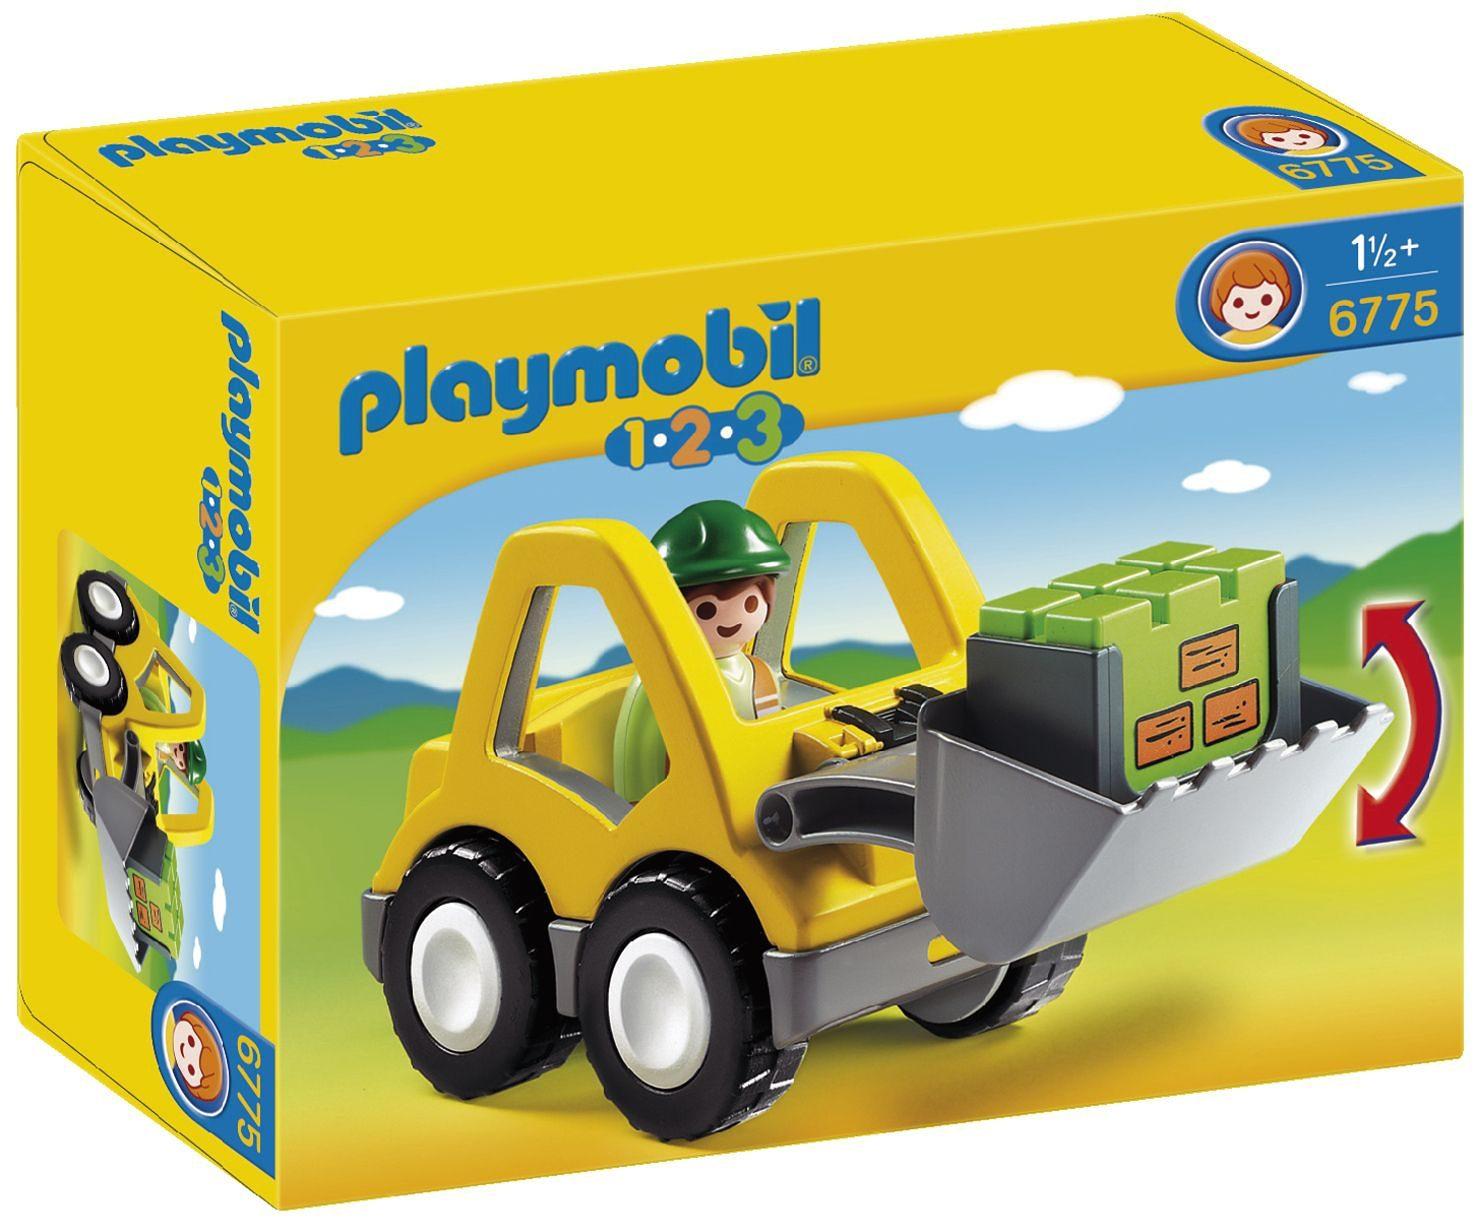 Playmobil Dollhouse Slaapkamer : Online playmobil kopen otto